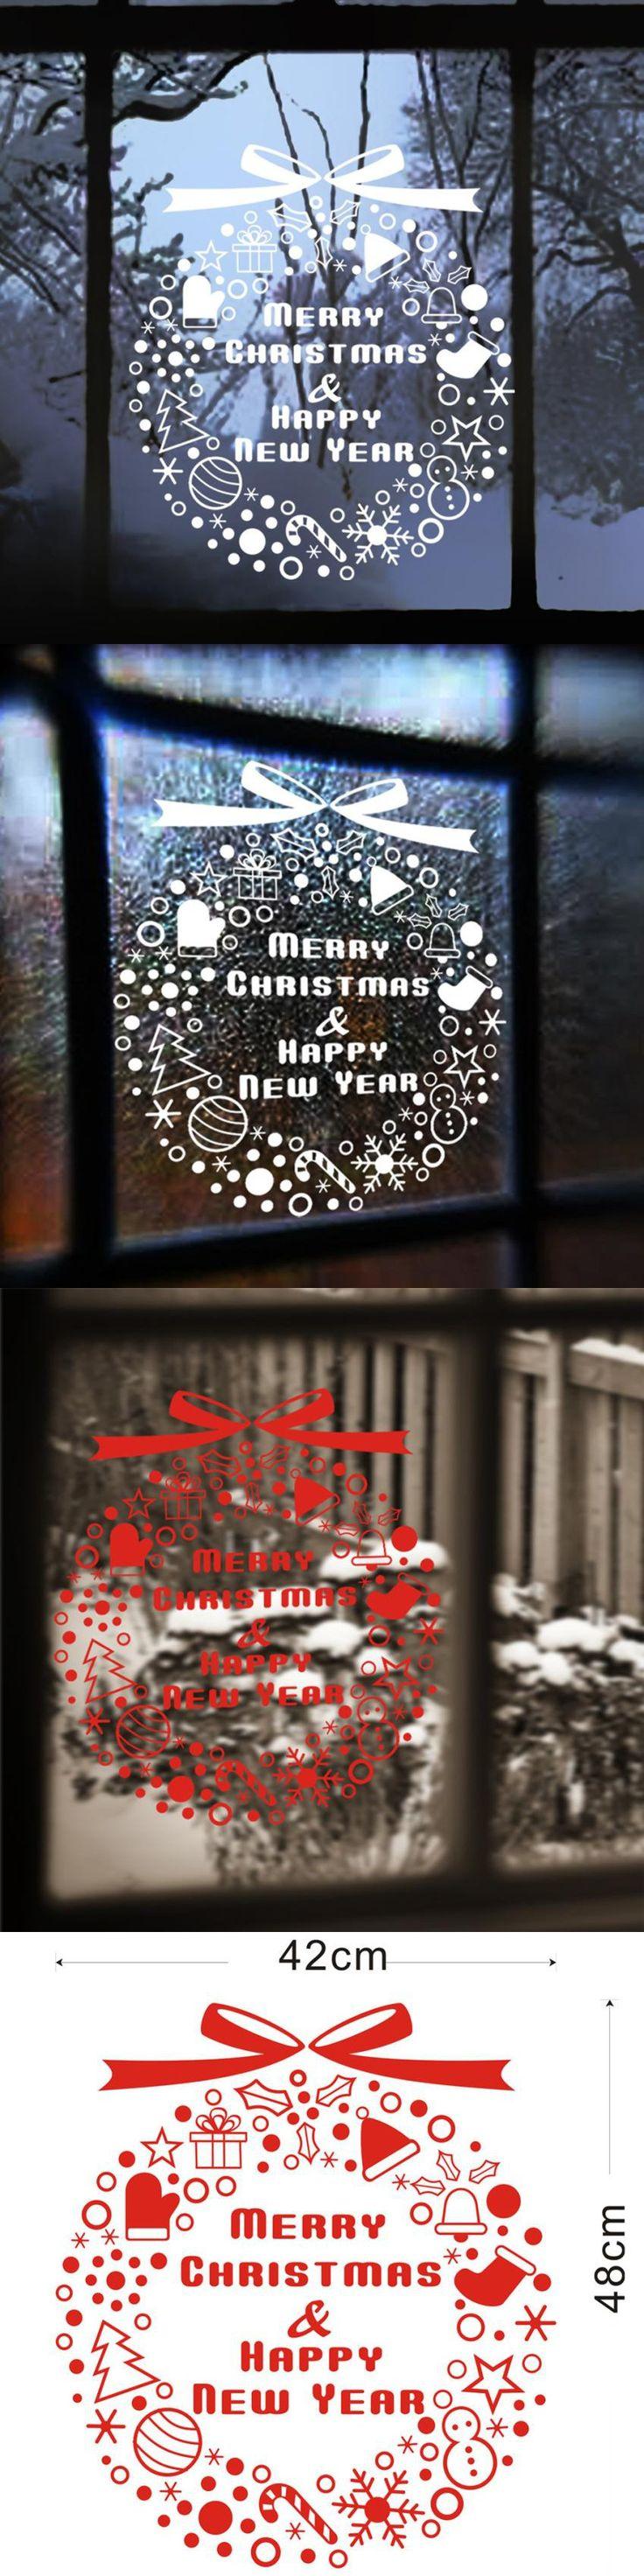 Christmas Decoration Articulos De Navidad Decal Window Stickers Home Decor Enfeites De Natal Christmas Decorations For Home $3.15